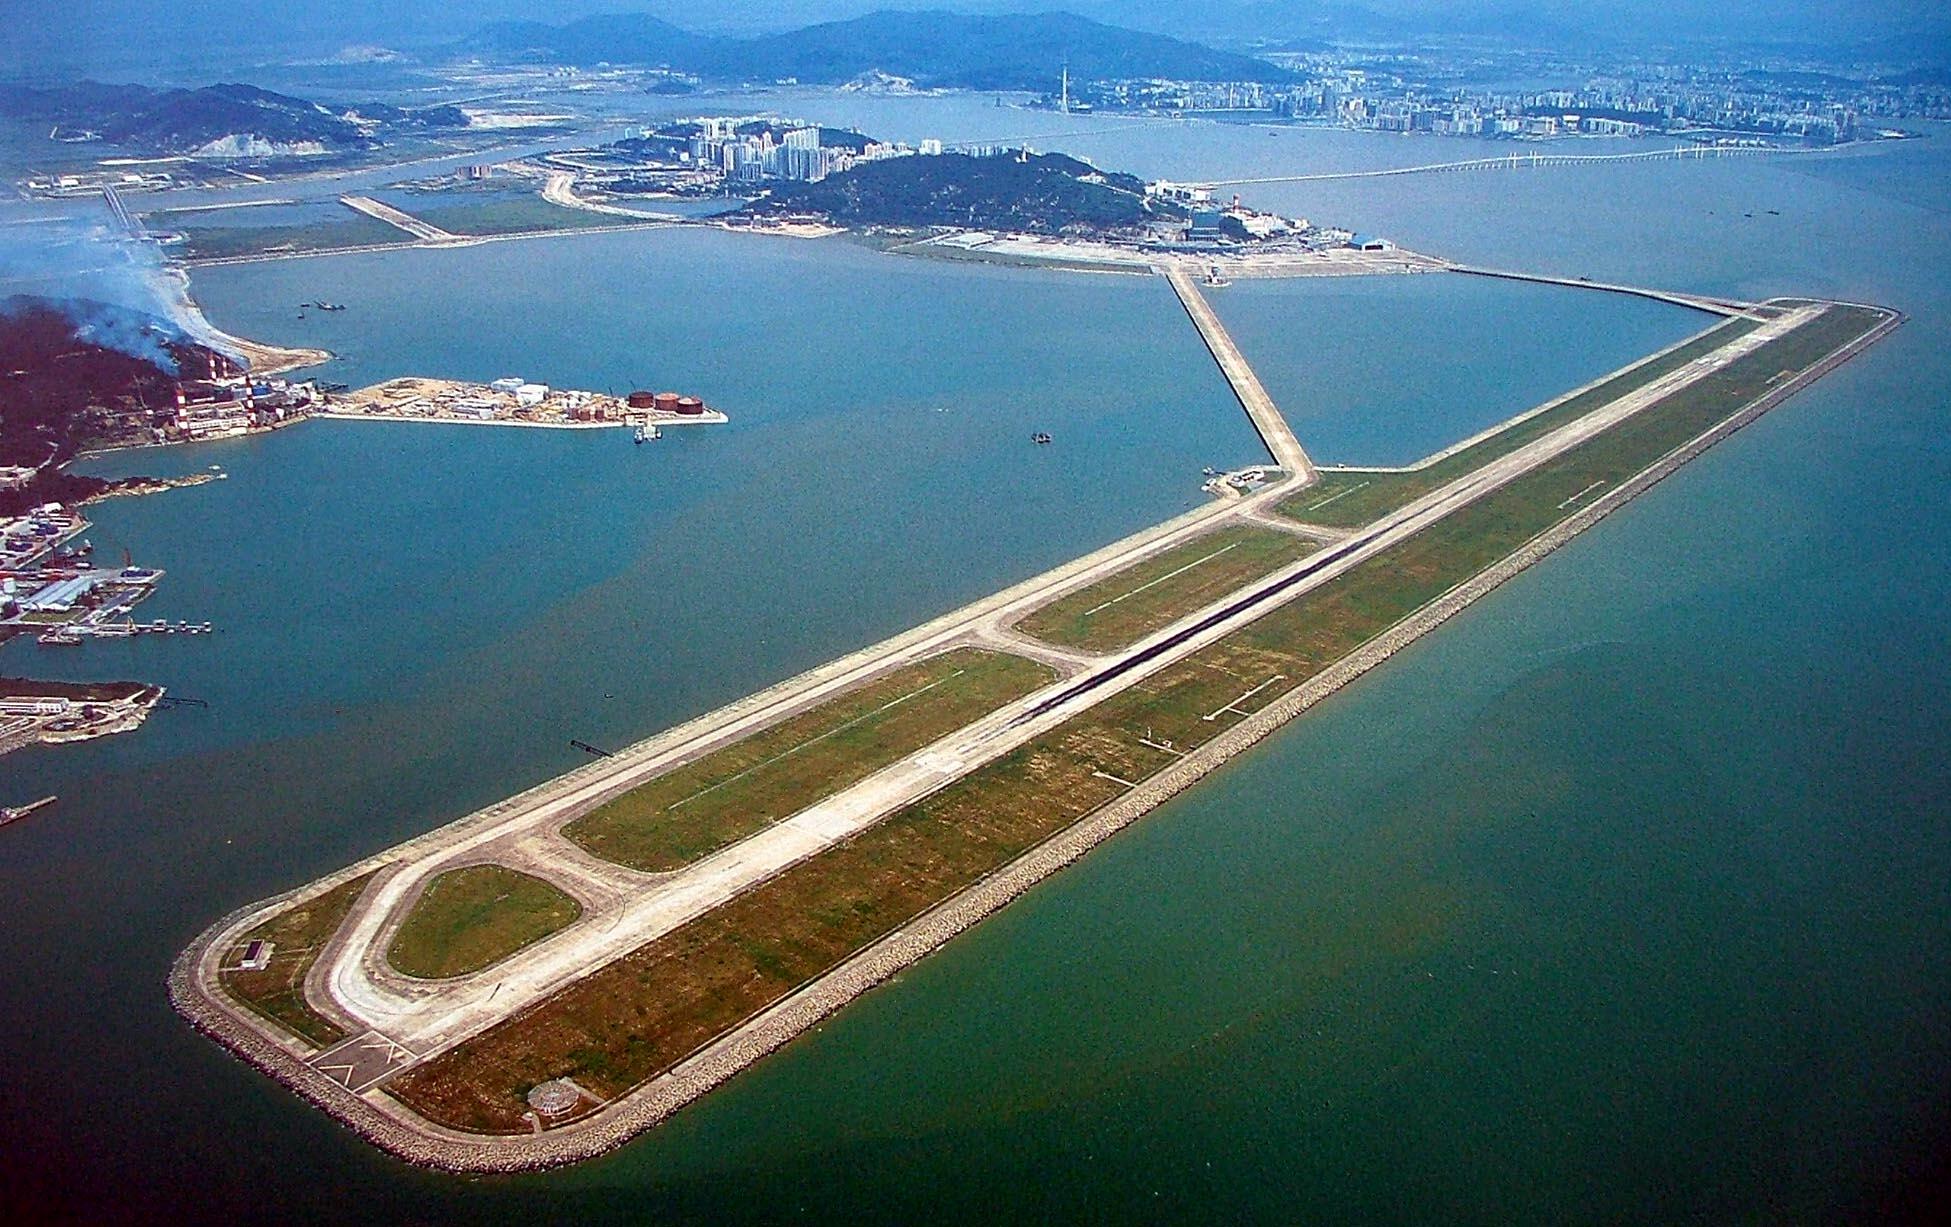 فرودگاه بین المللی ماکائو چین